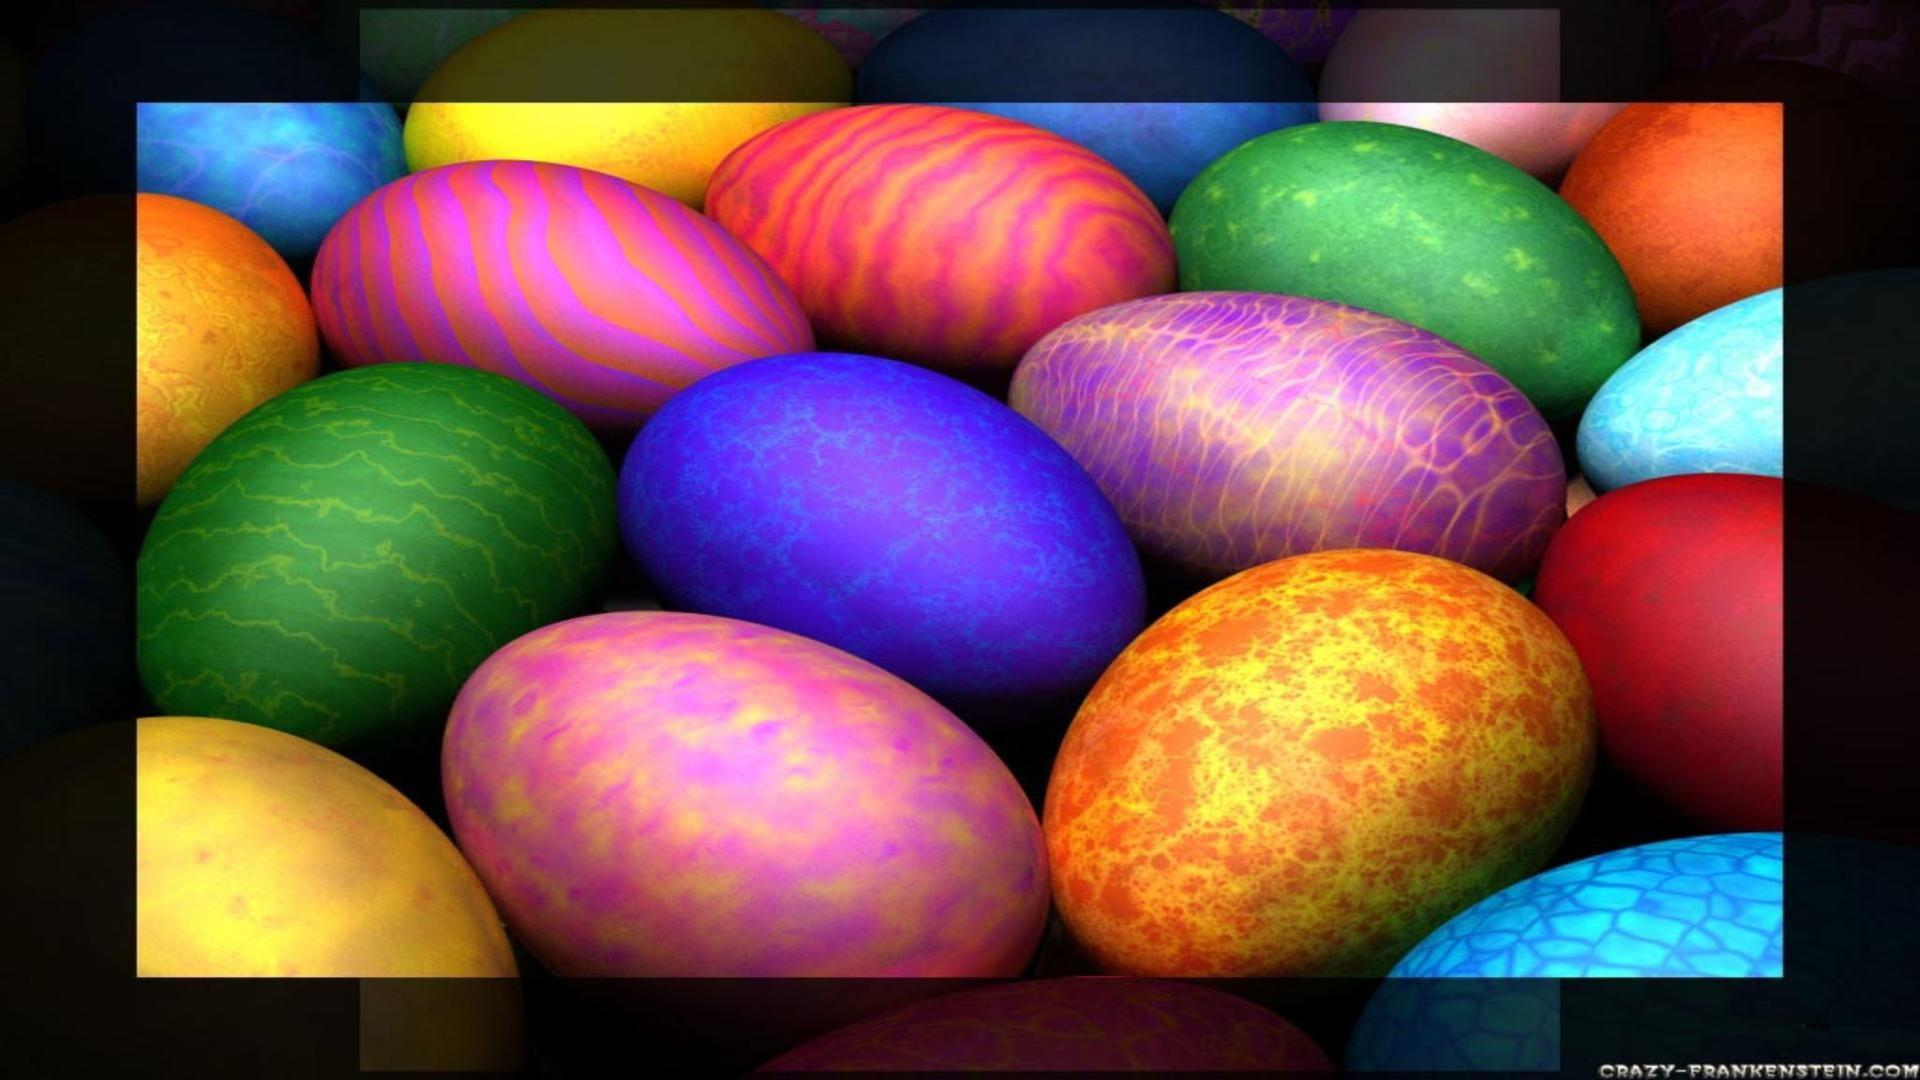 Easter Desktop Wallpaper Backgrounds 1920x1080